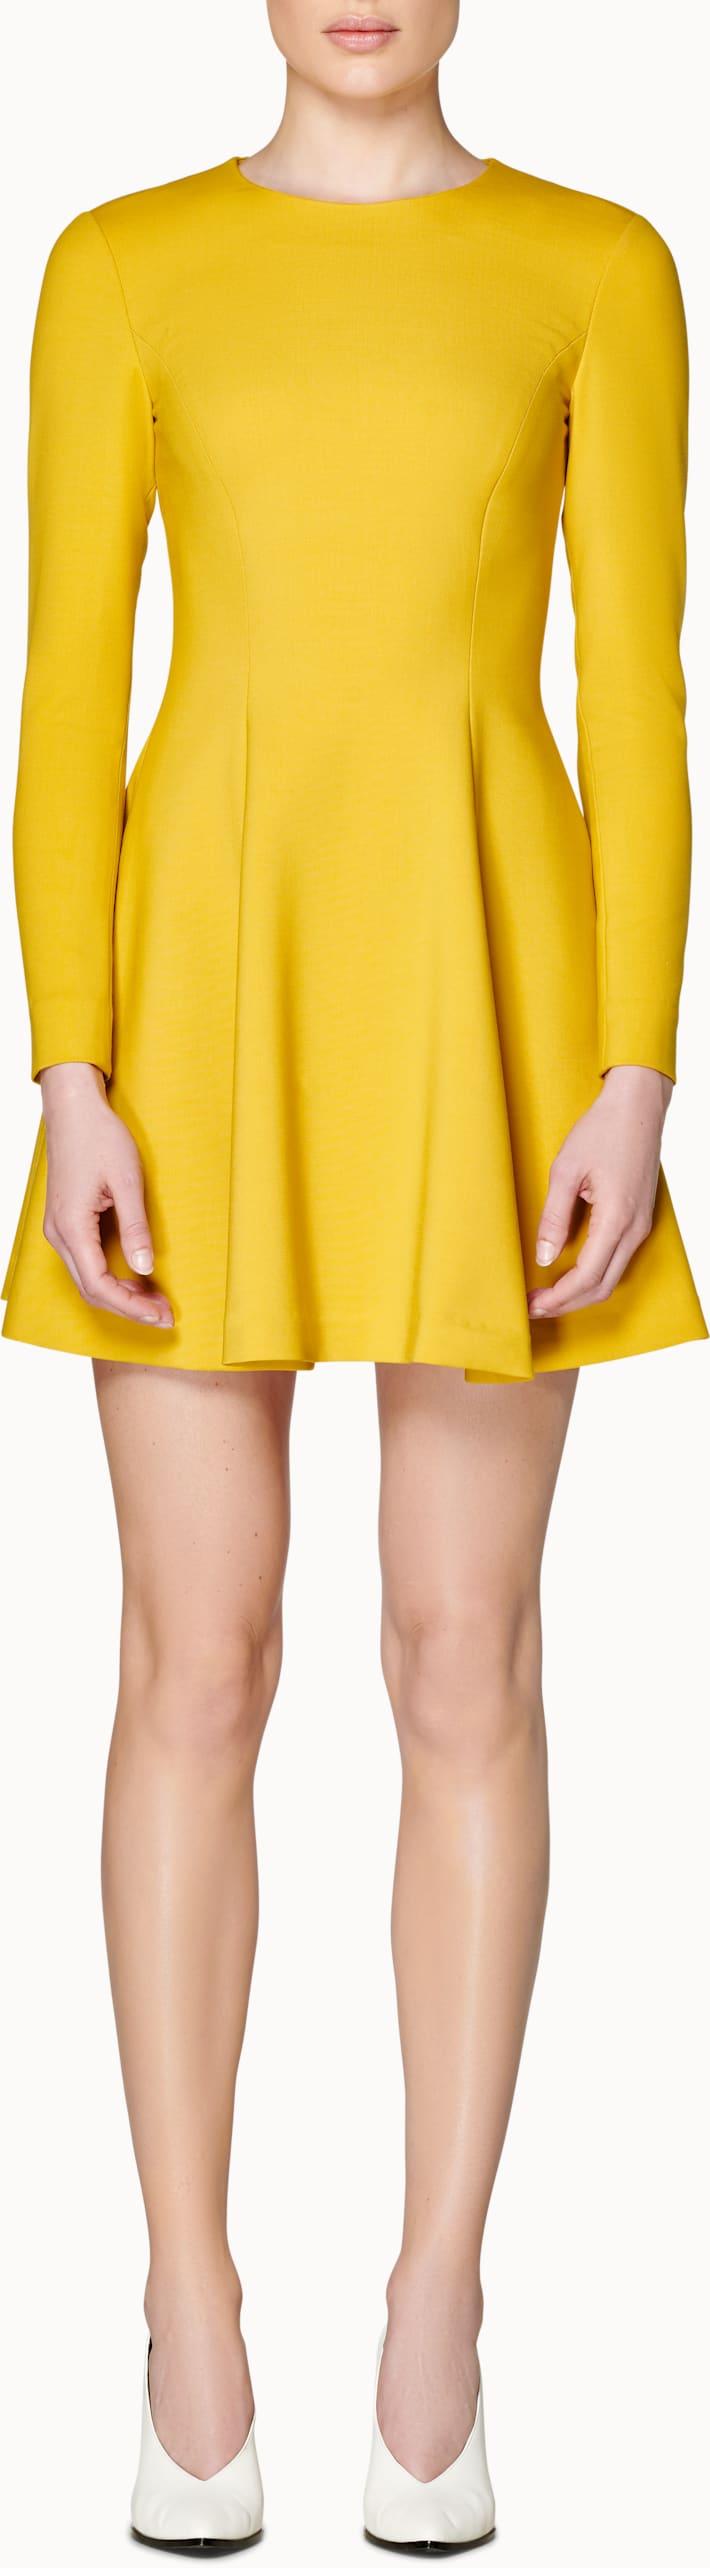 Alton Sunshine Yellow  Dress